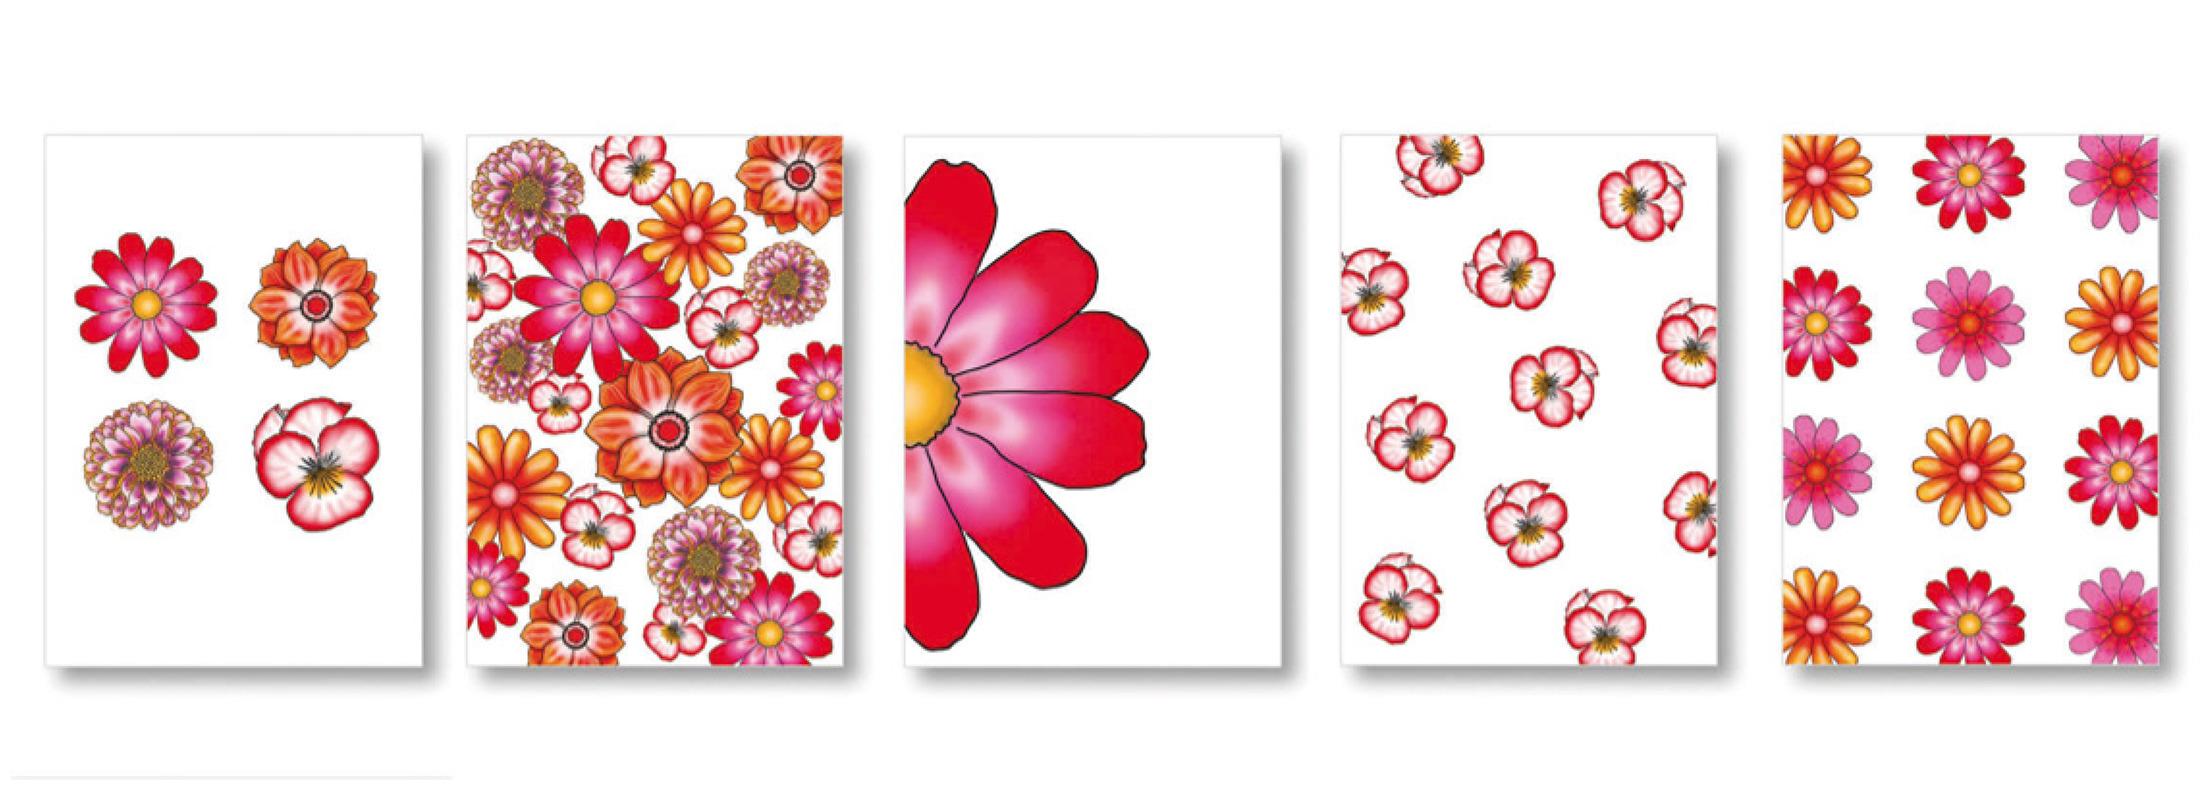 Ansichtkaarten serie bloemen by Marit van Buchem